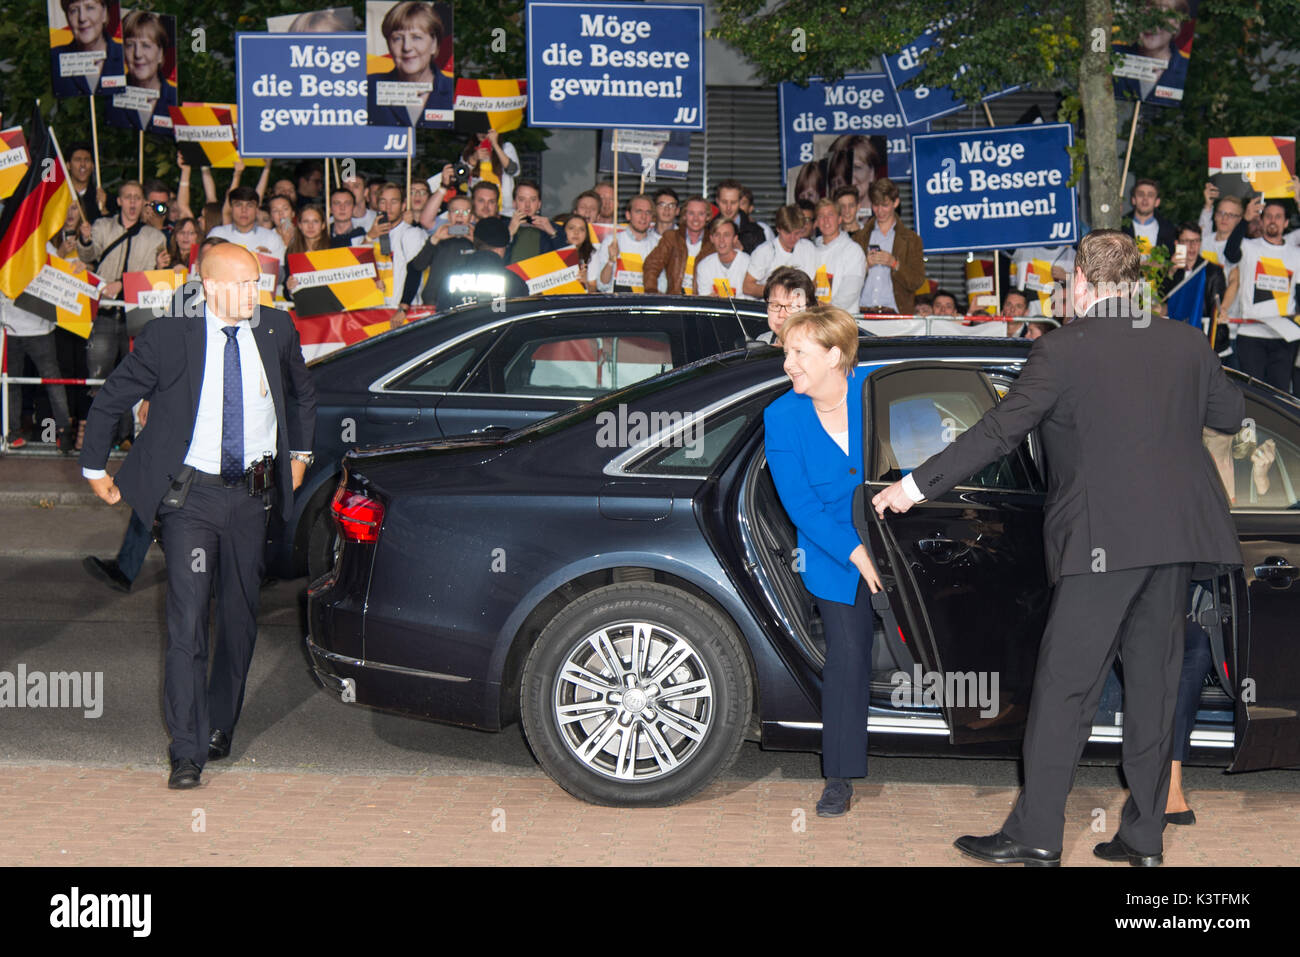 Berlin, Germany. 03rd Sep, 2017. Dr. Angela Merkel, arriving at, In the background some fans and members of CDU - JU, TV - election - duel, Dr. Angela Merkel - CDU vs. Martin Schulz - SPD, GER, 03.09.2017, Foto: Uwe Koch/fotobasis.de Credit: Uwe Koch/Alamy Live News - Stock Image